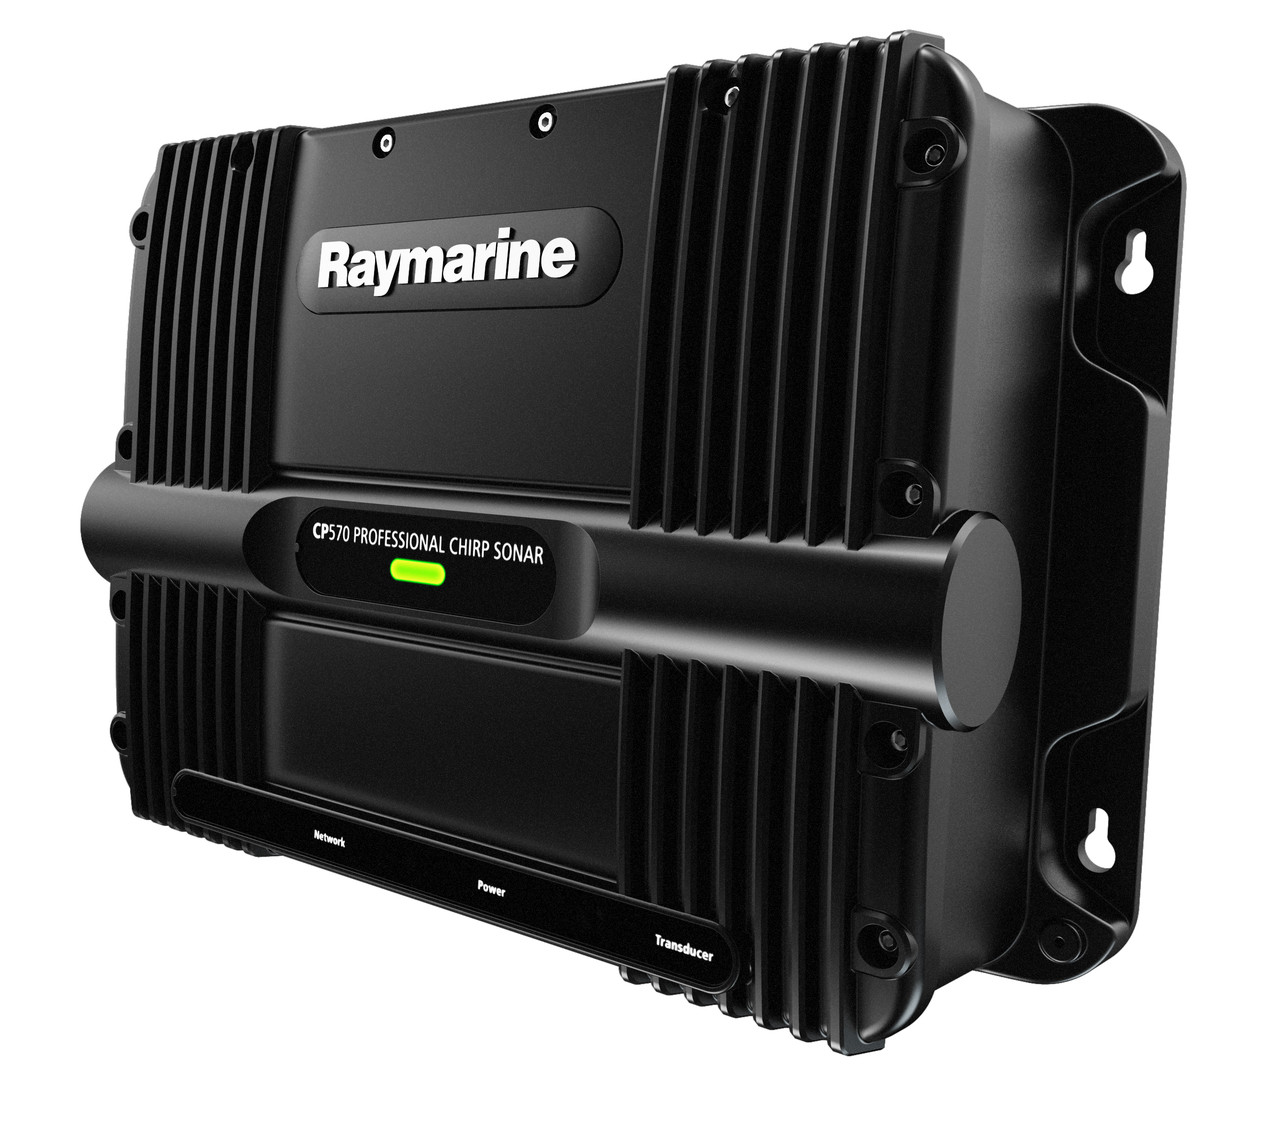 Raymarine CP570 ClearPulse Chirp Sonar Module Fishfinder Right Side